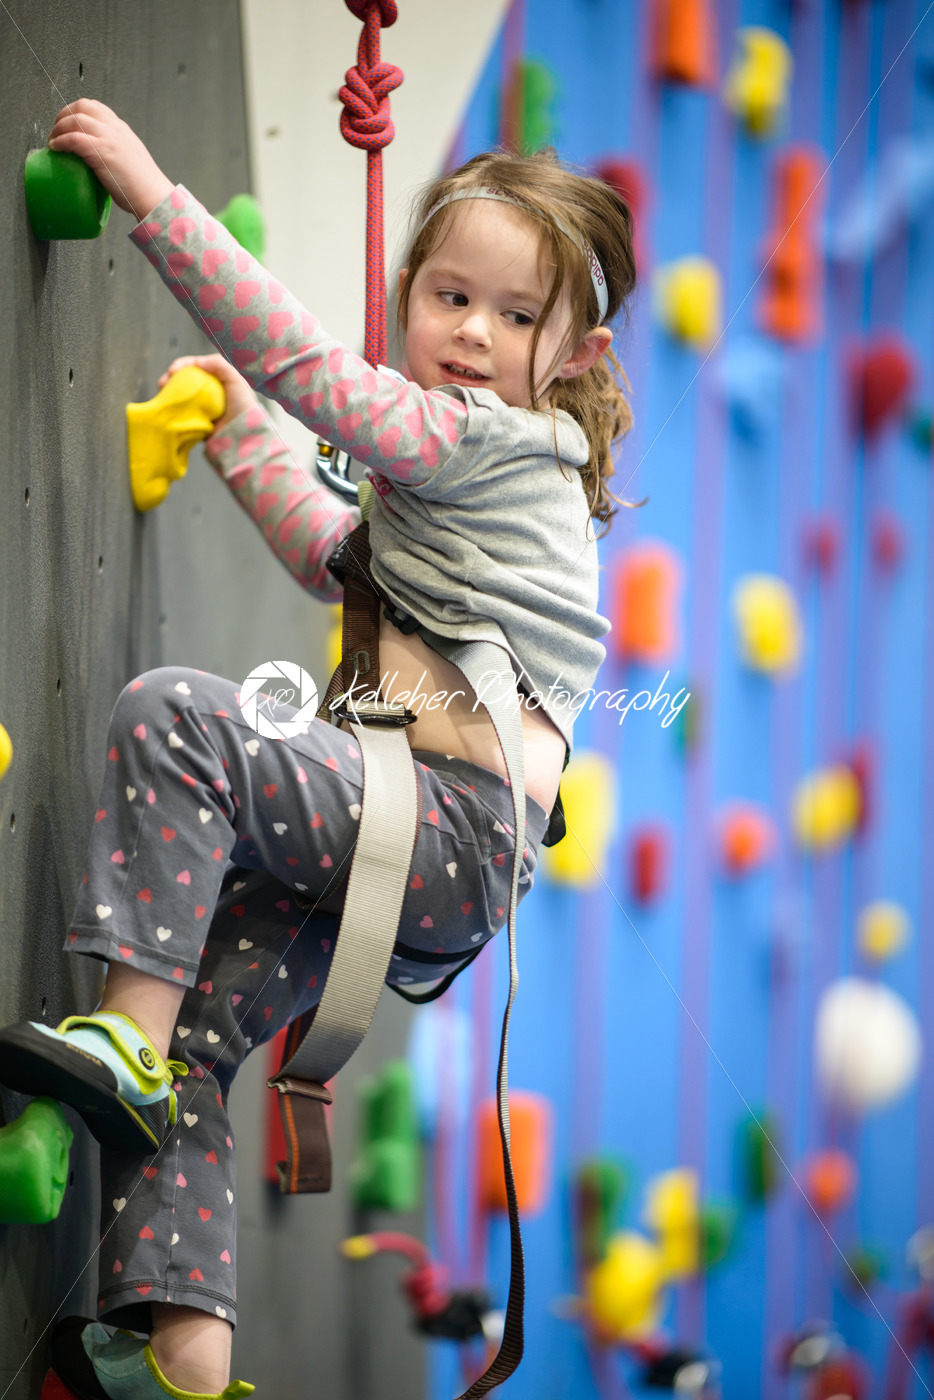 little girl climbing a rock wall indoor - Kelleher Photography Store